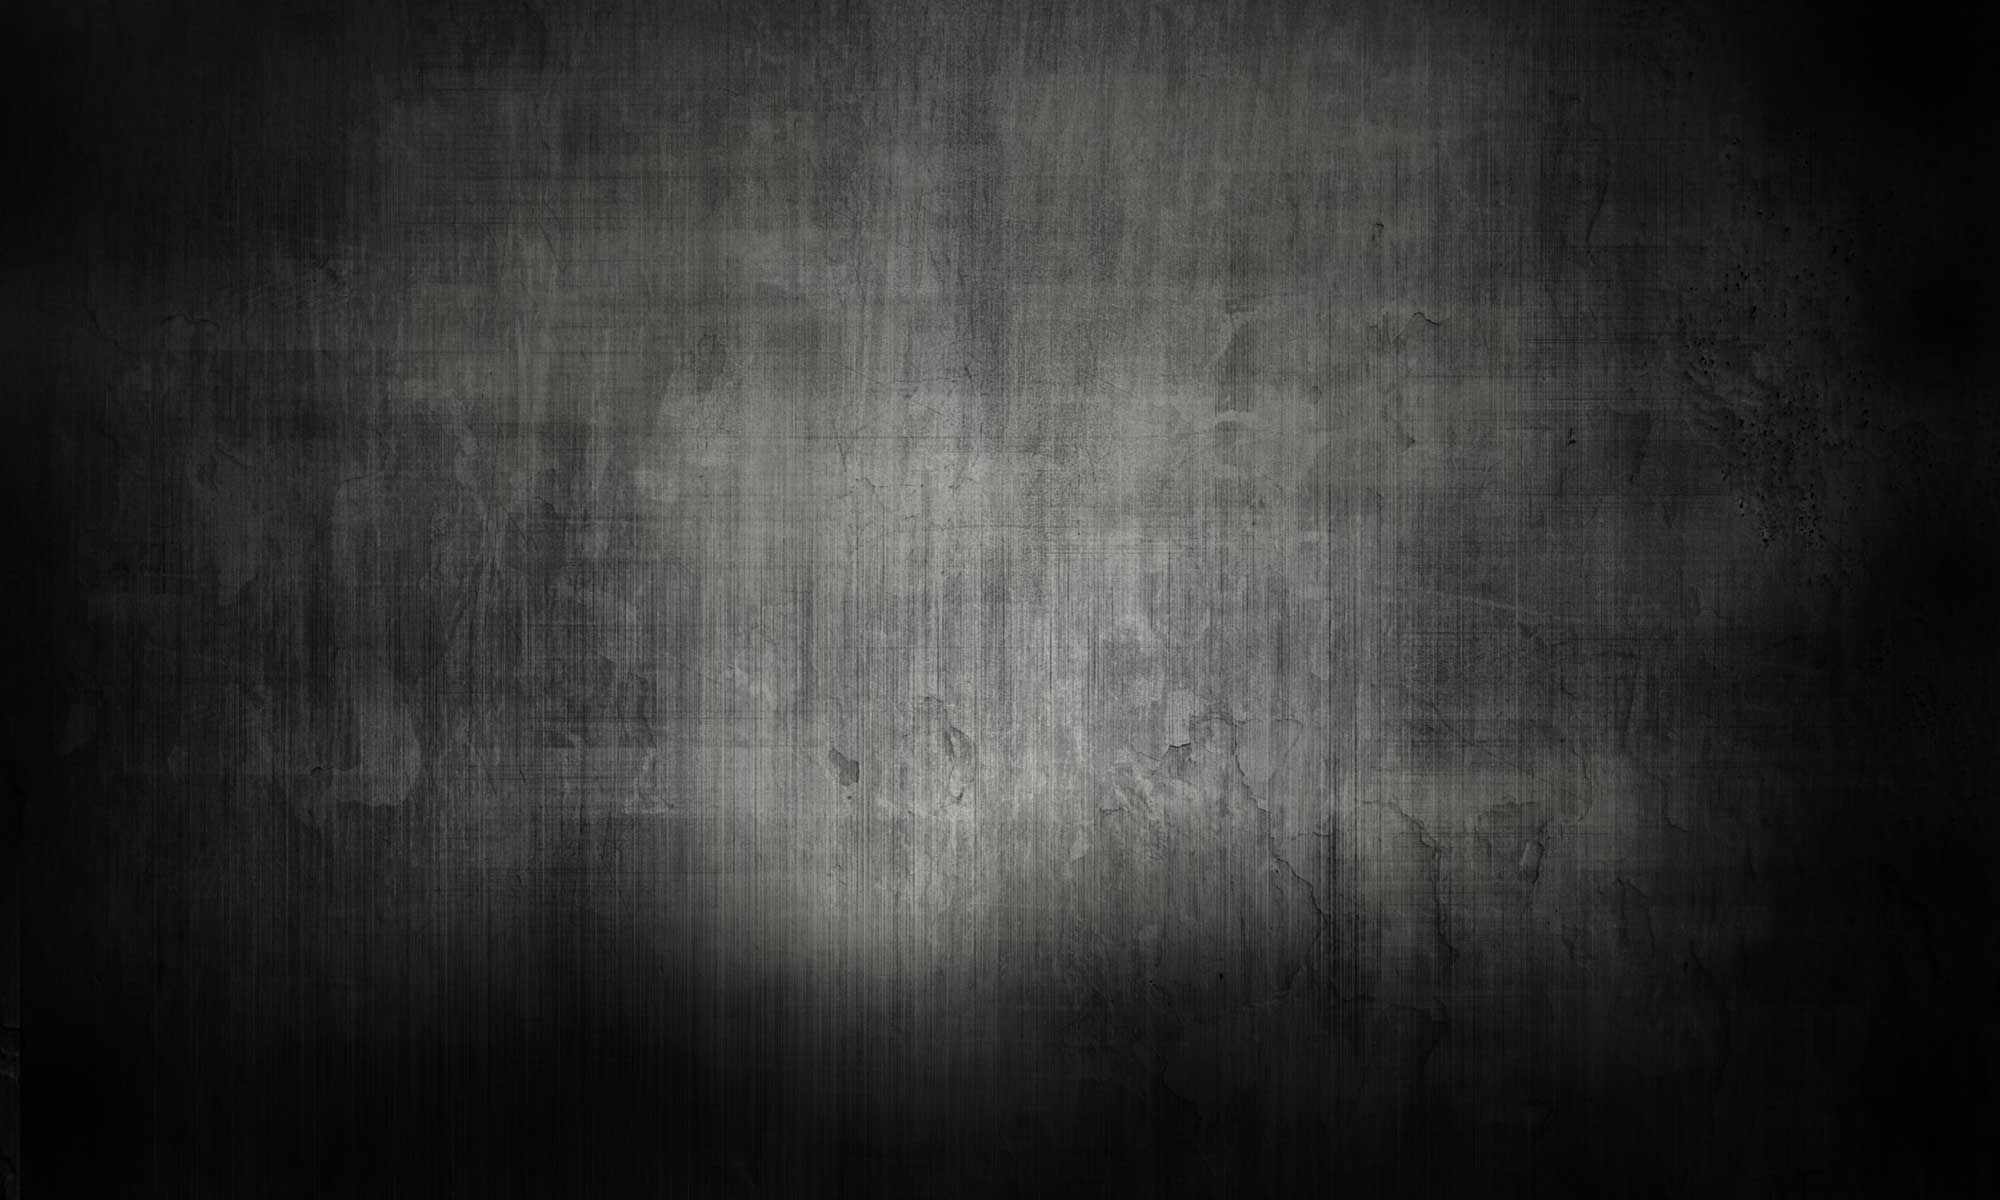 Black Gradient Wallpapers - Wallpaper Cave